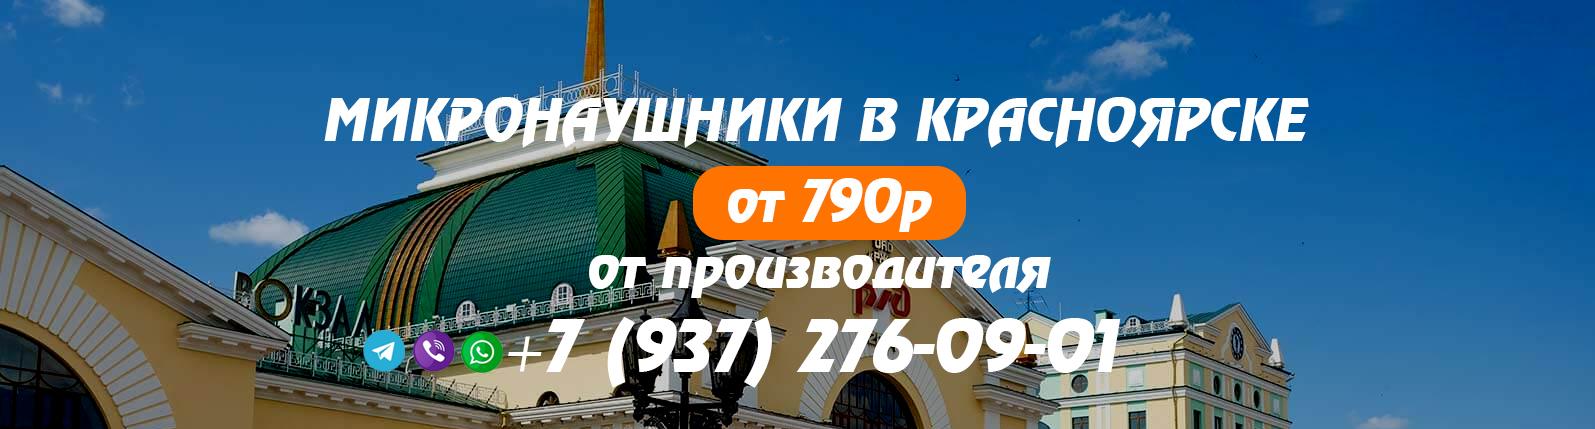 mikronaushniki-krasnoyarsk